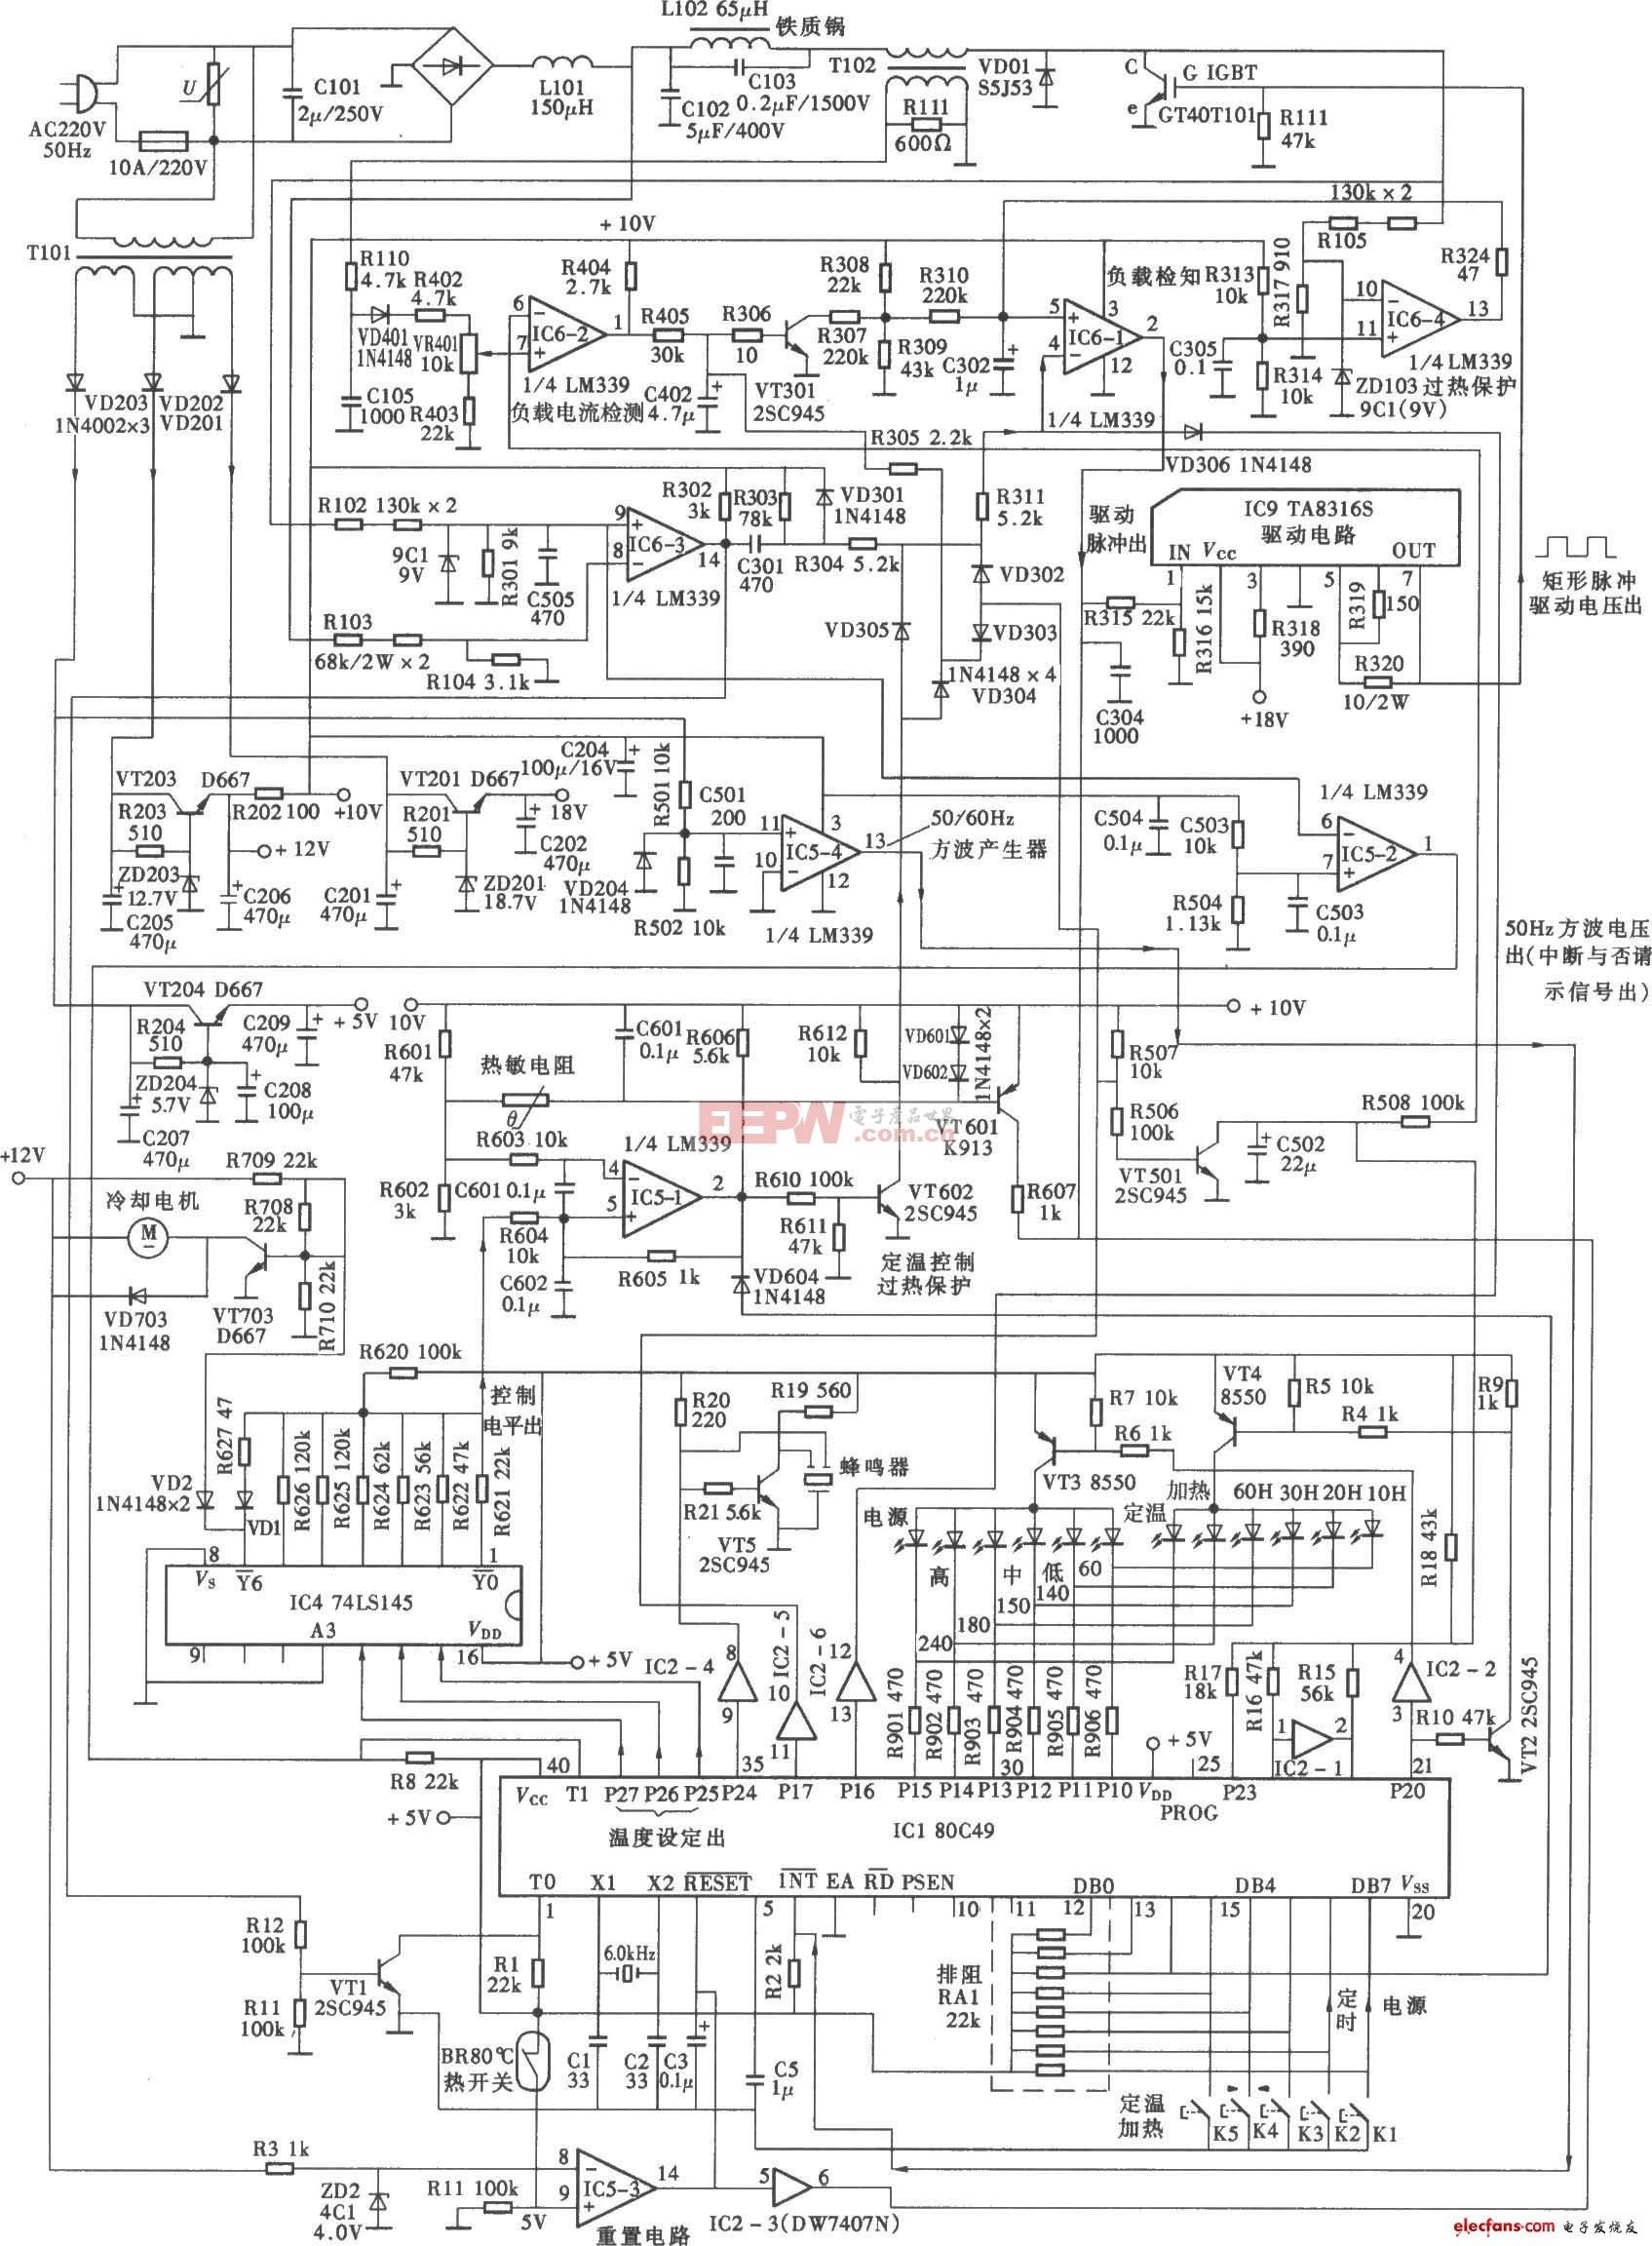 GCl6型格力电磁炉原理图